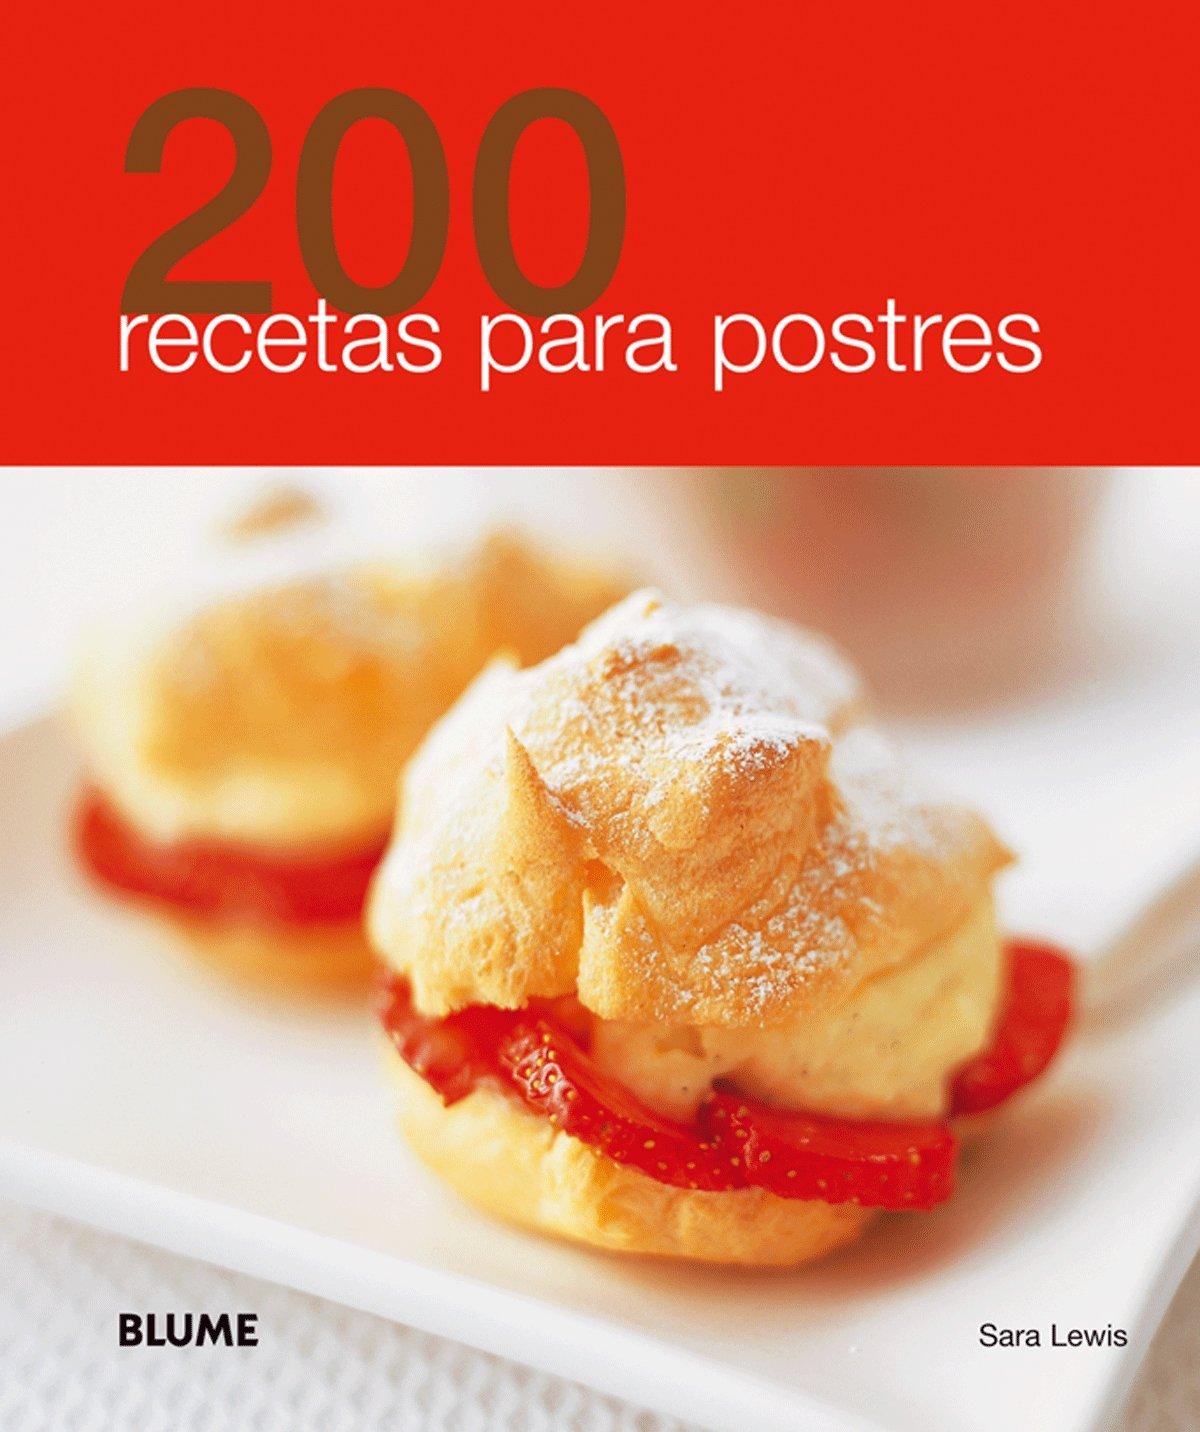 200 recetas para postres (Spanish Edition): Sara Lewis: 9788480769075:  Amazon.com: Books